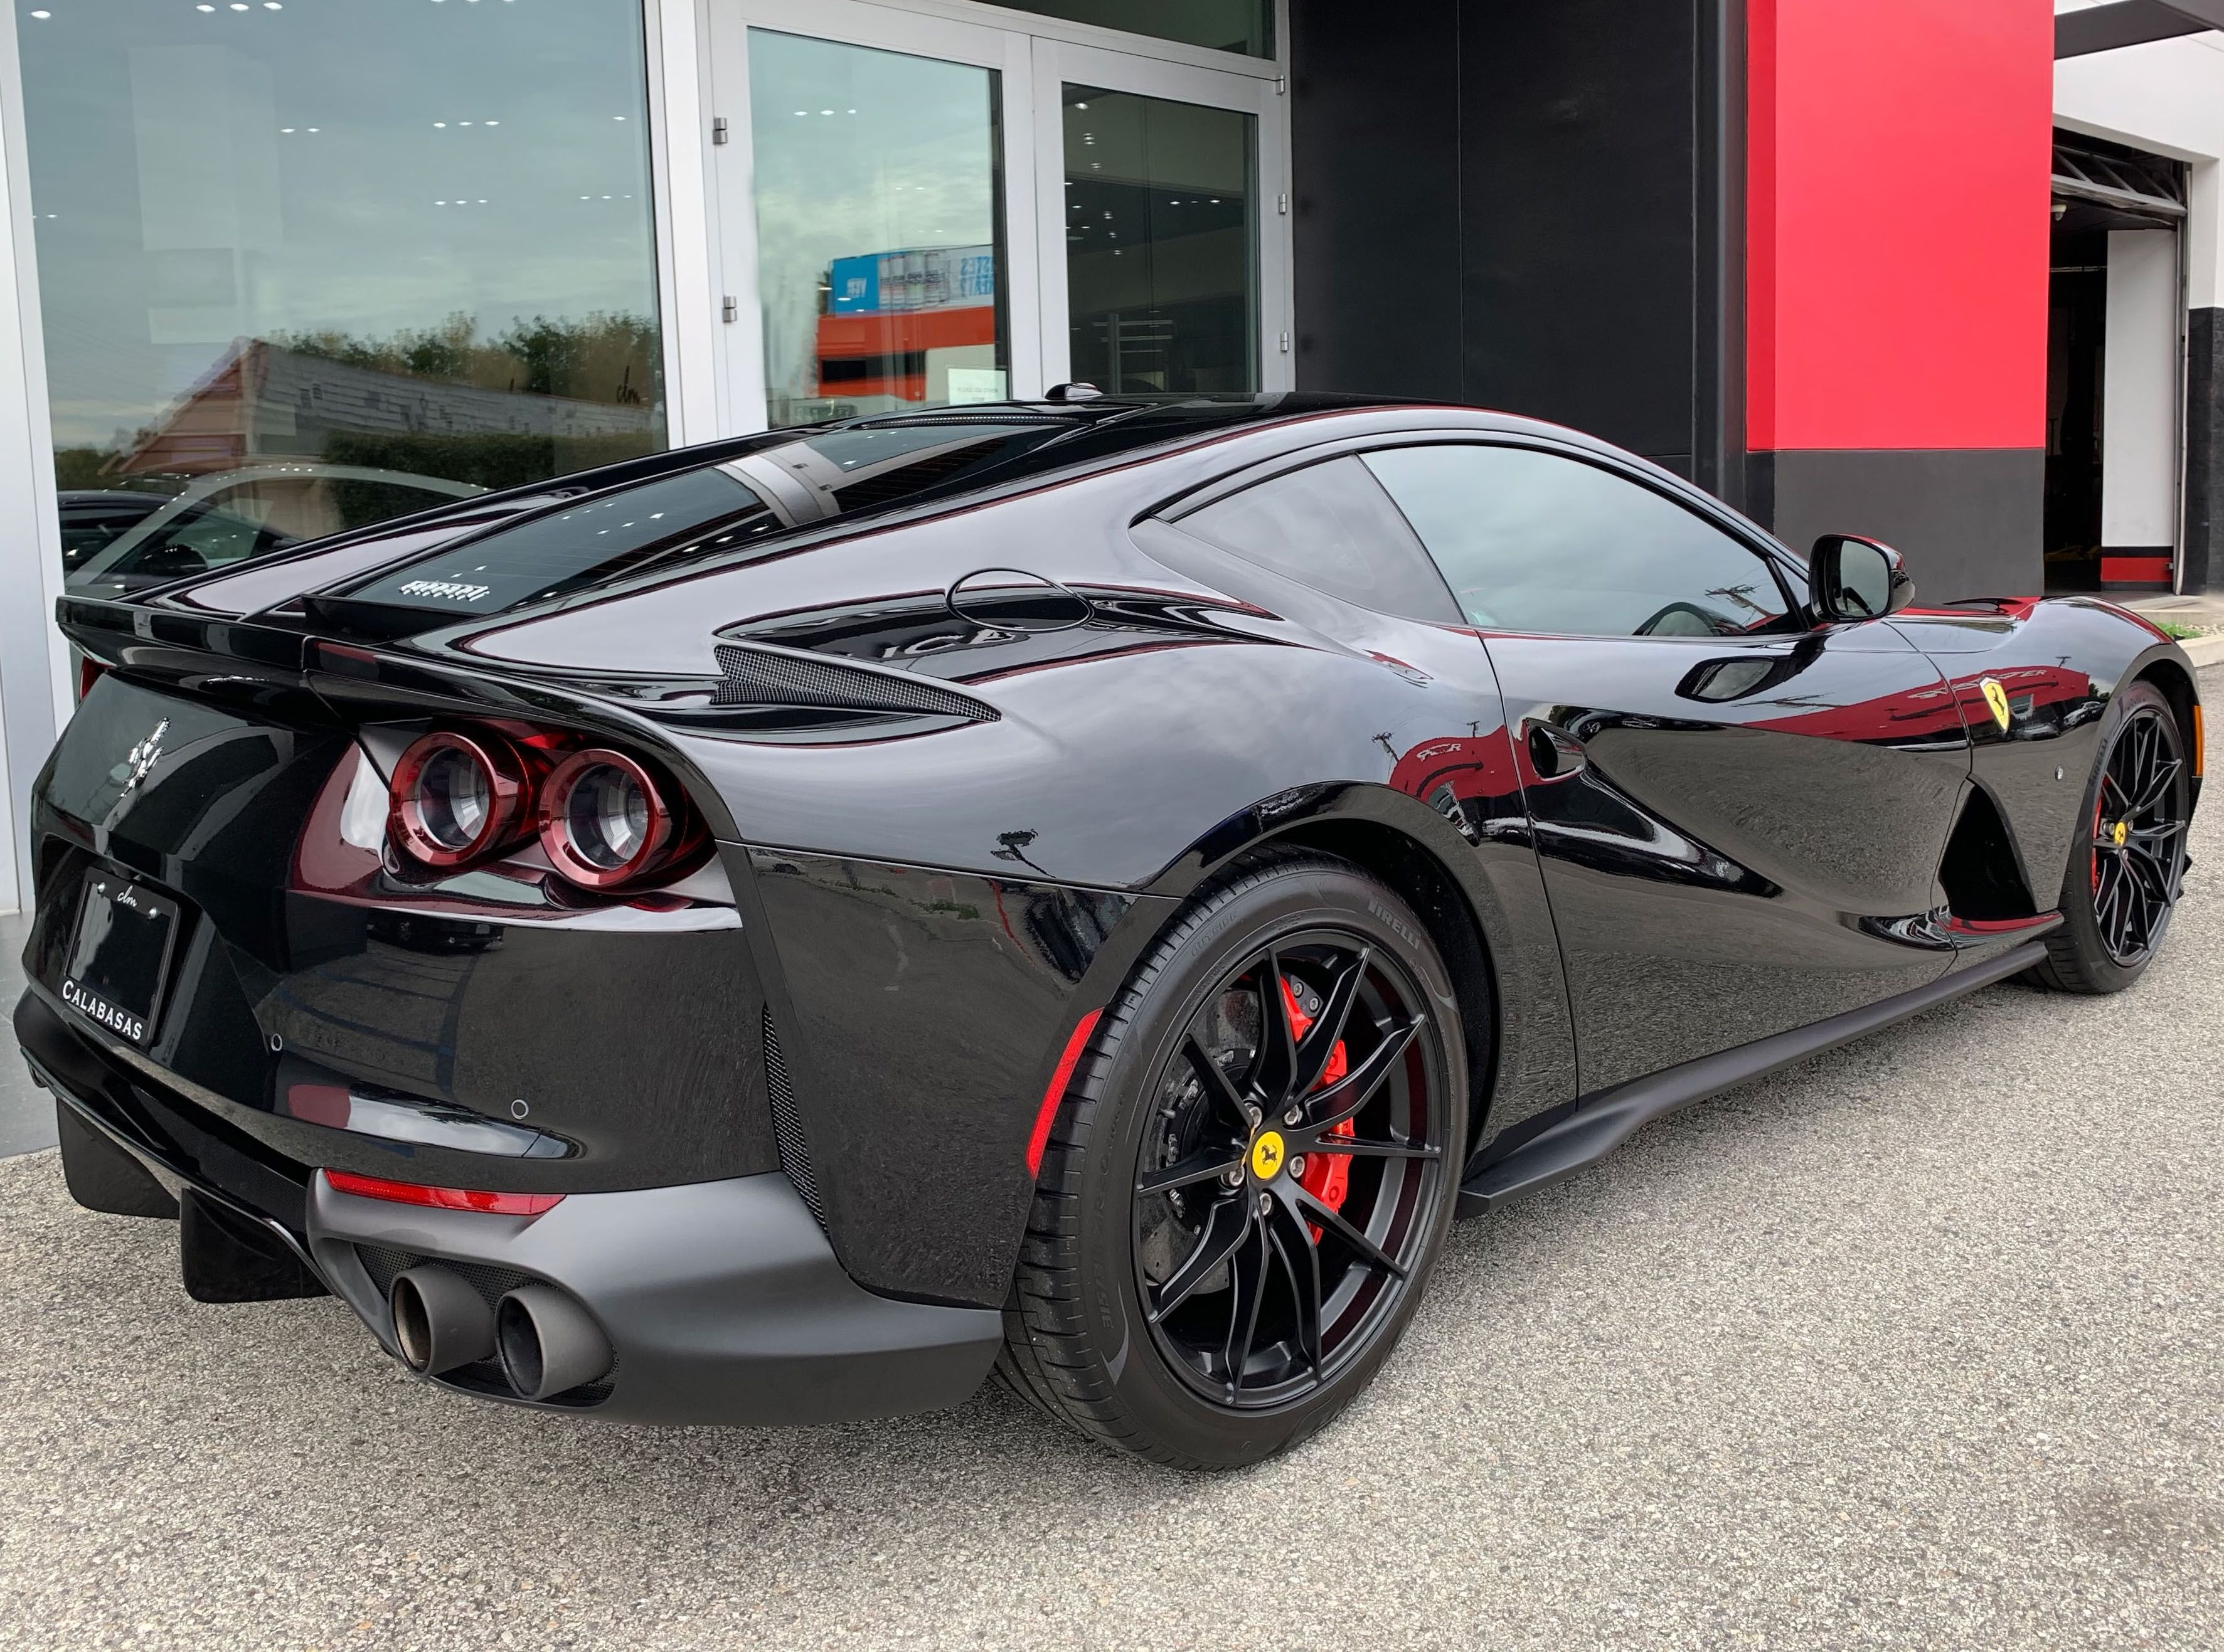 2018 Ferrari 812 Superfast In 2020 Fast Sports Cars Ferrari Ferrari World